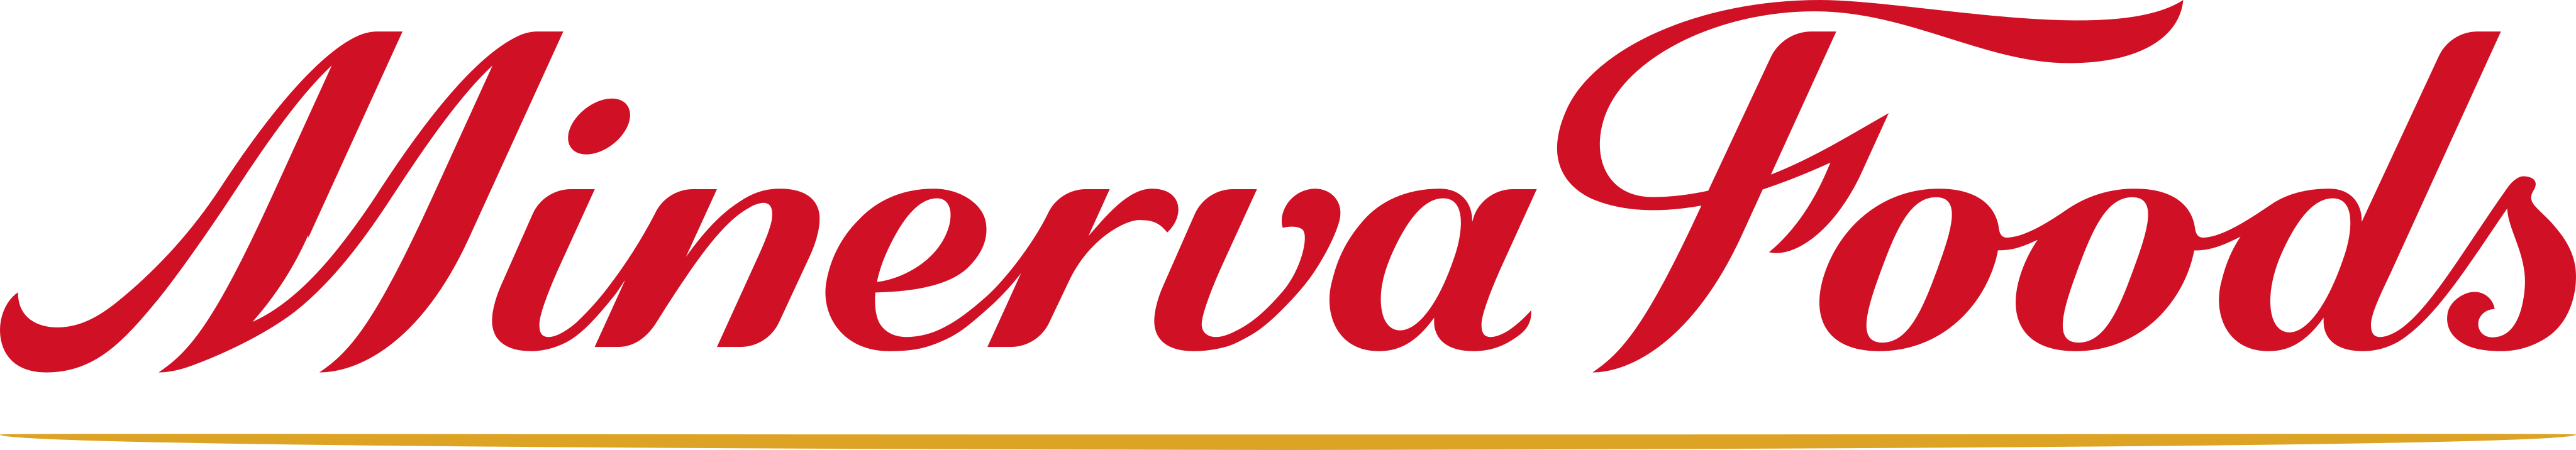 minerva foods logo - Minerva Foods Logo